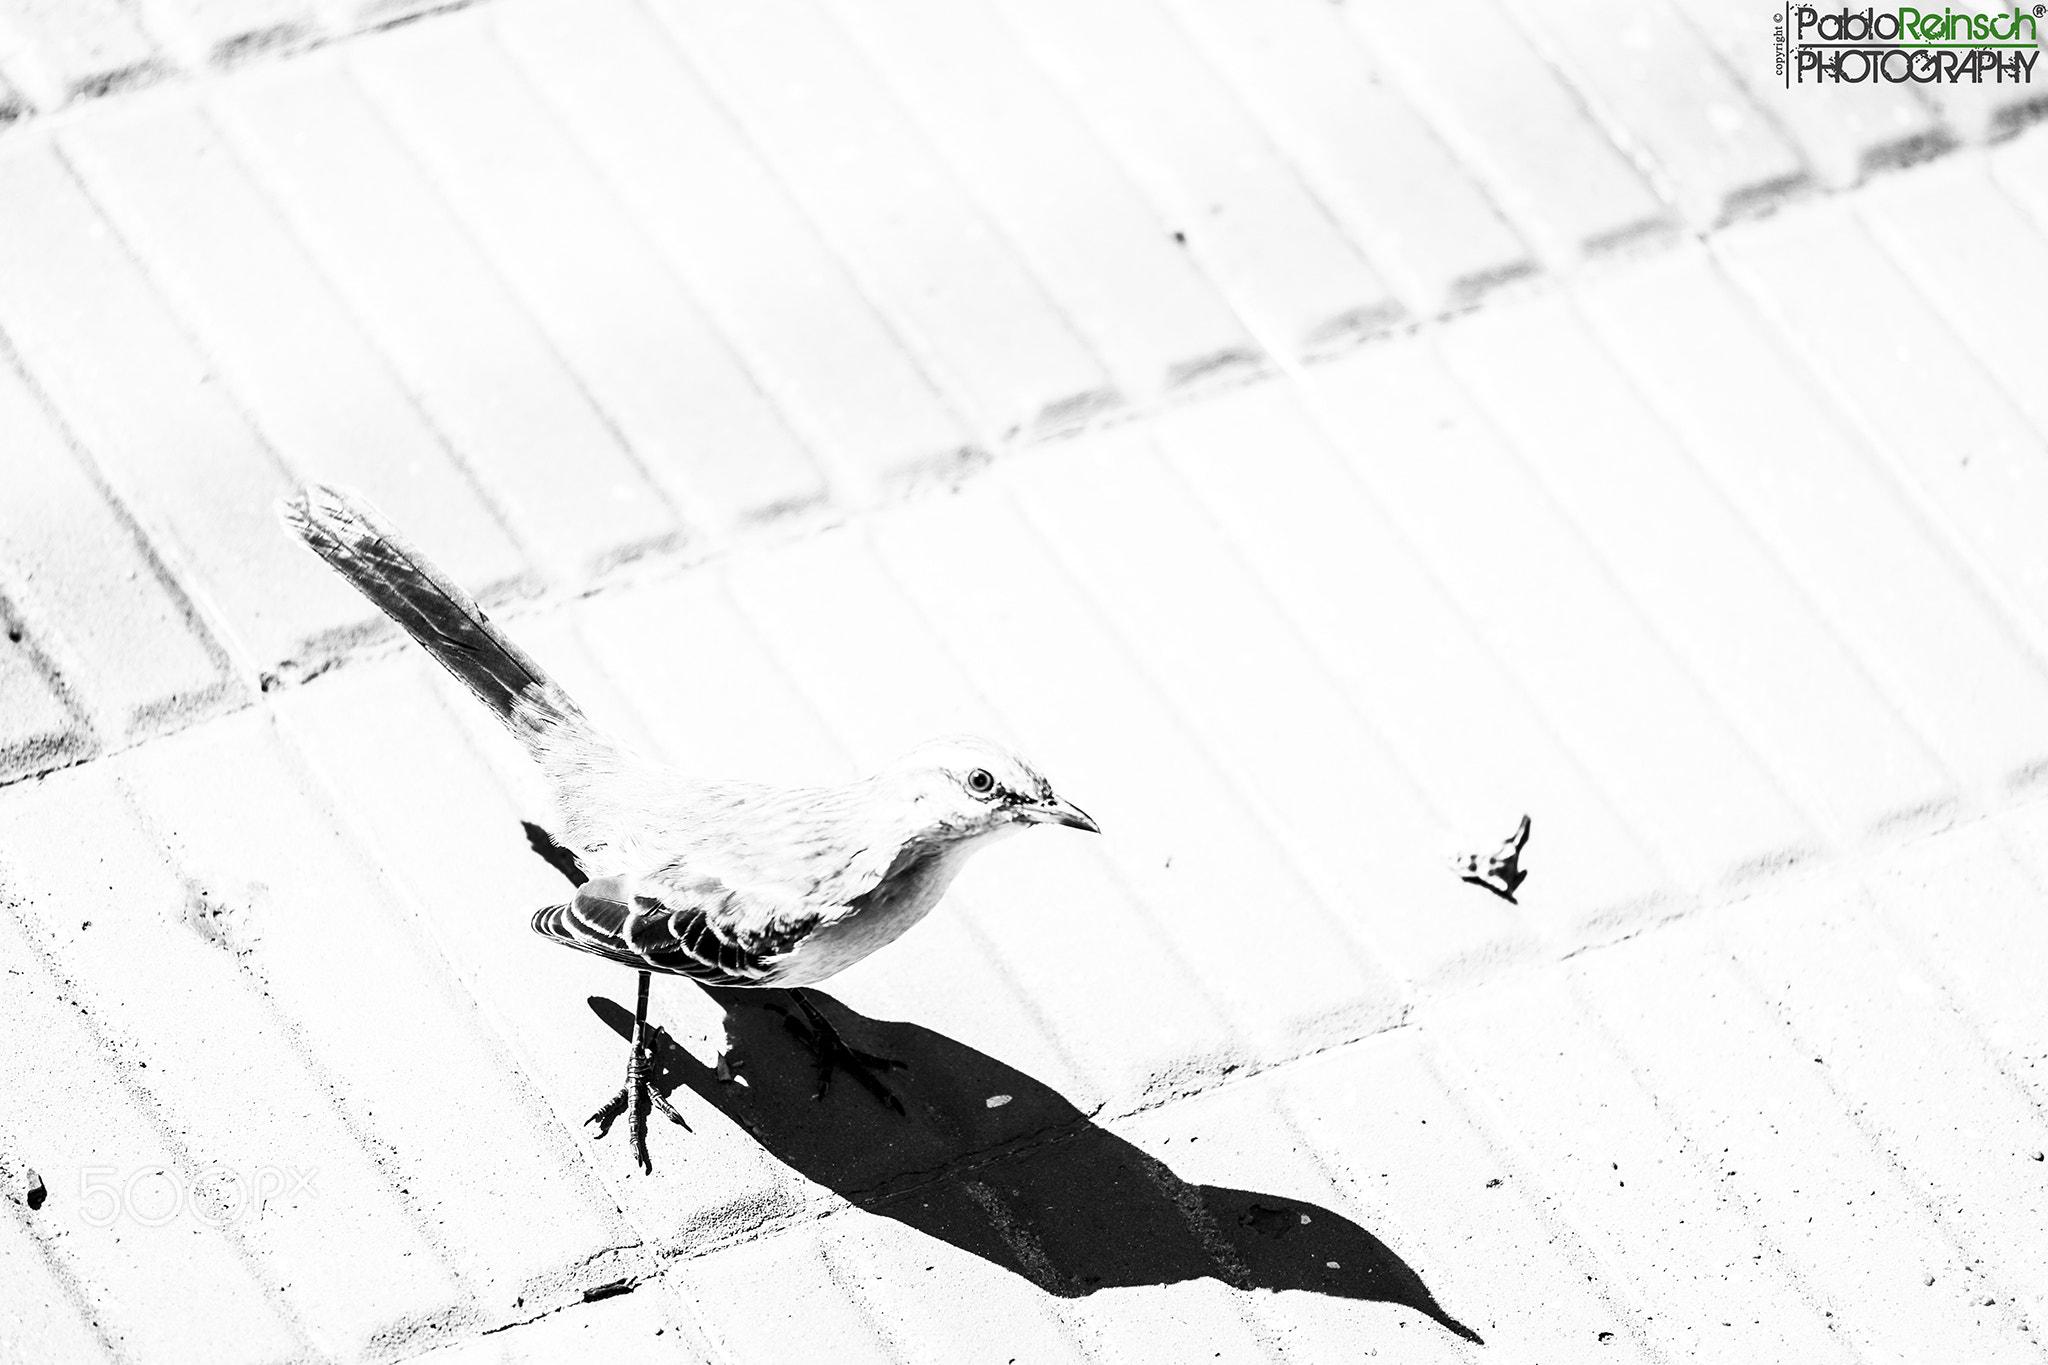 Photograph Calandria en clave alta.- by Pablo Reinsch on 500px